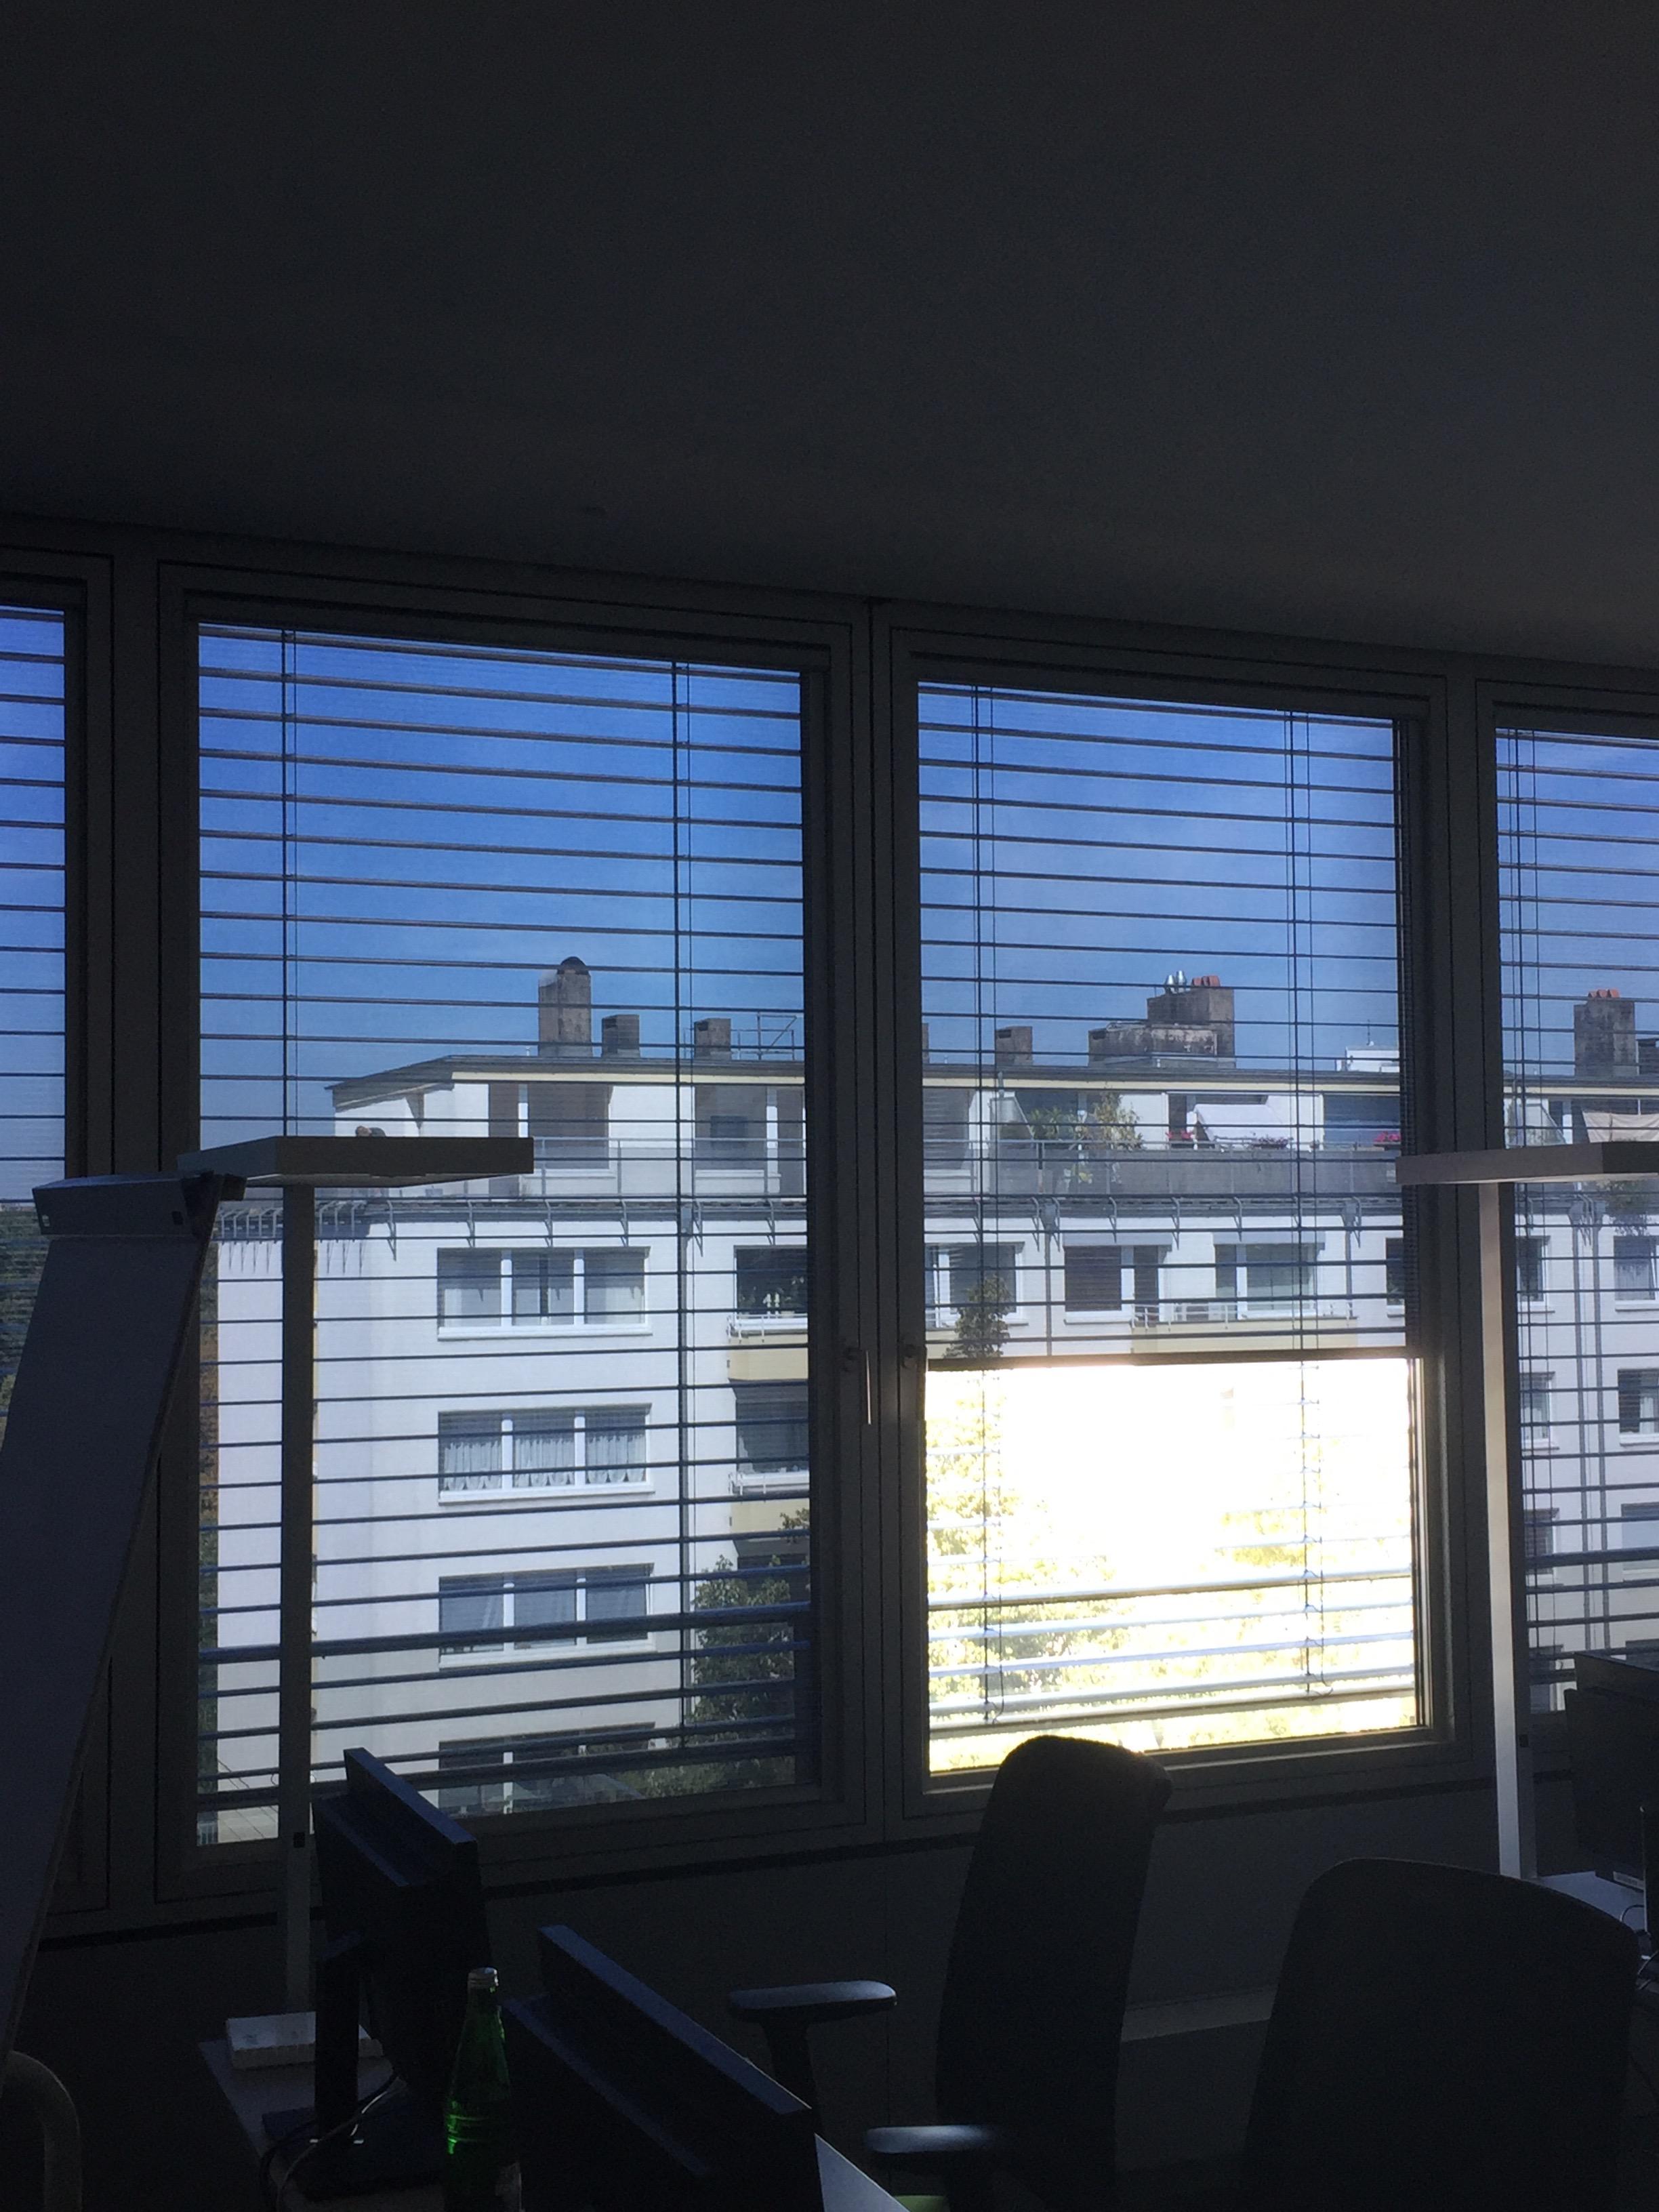 Multirollo® - Düsseldorf - Aussenjalousien und Sonnenschutz - Folienrollo innen